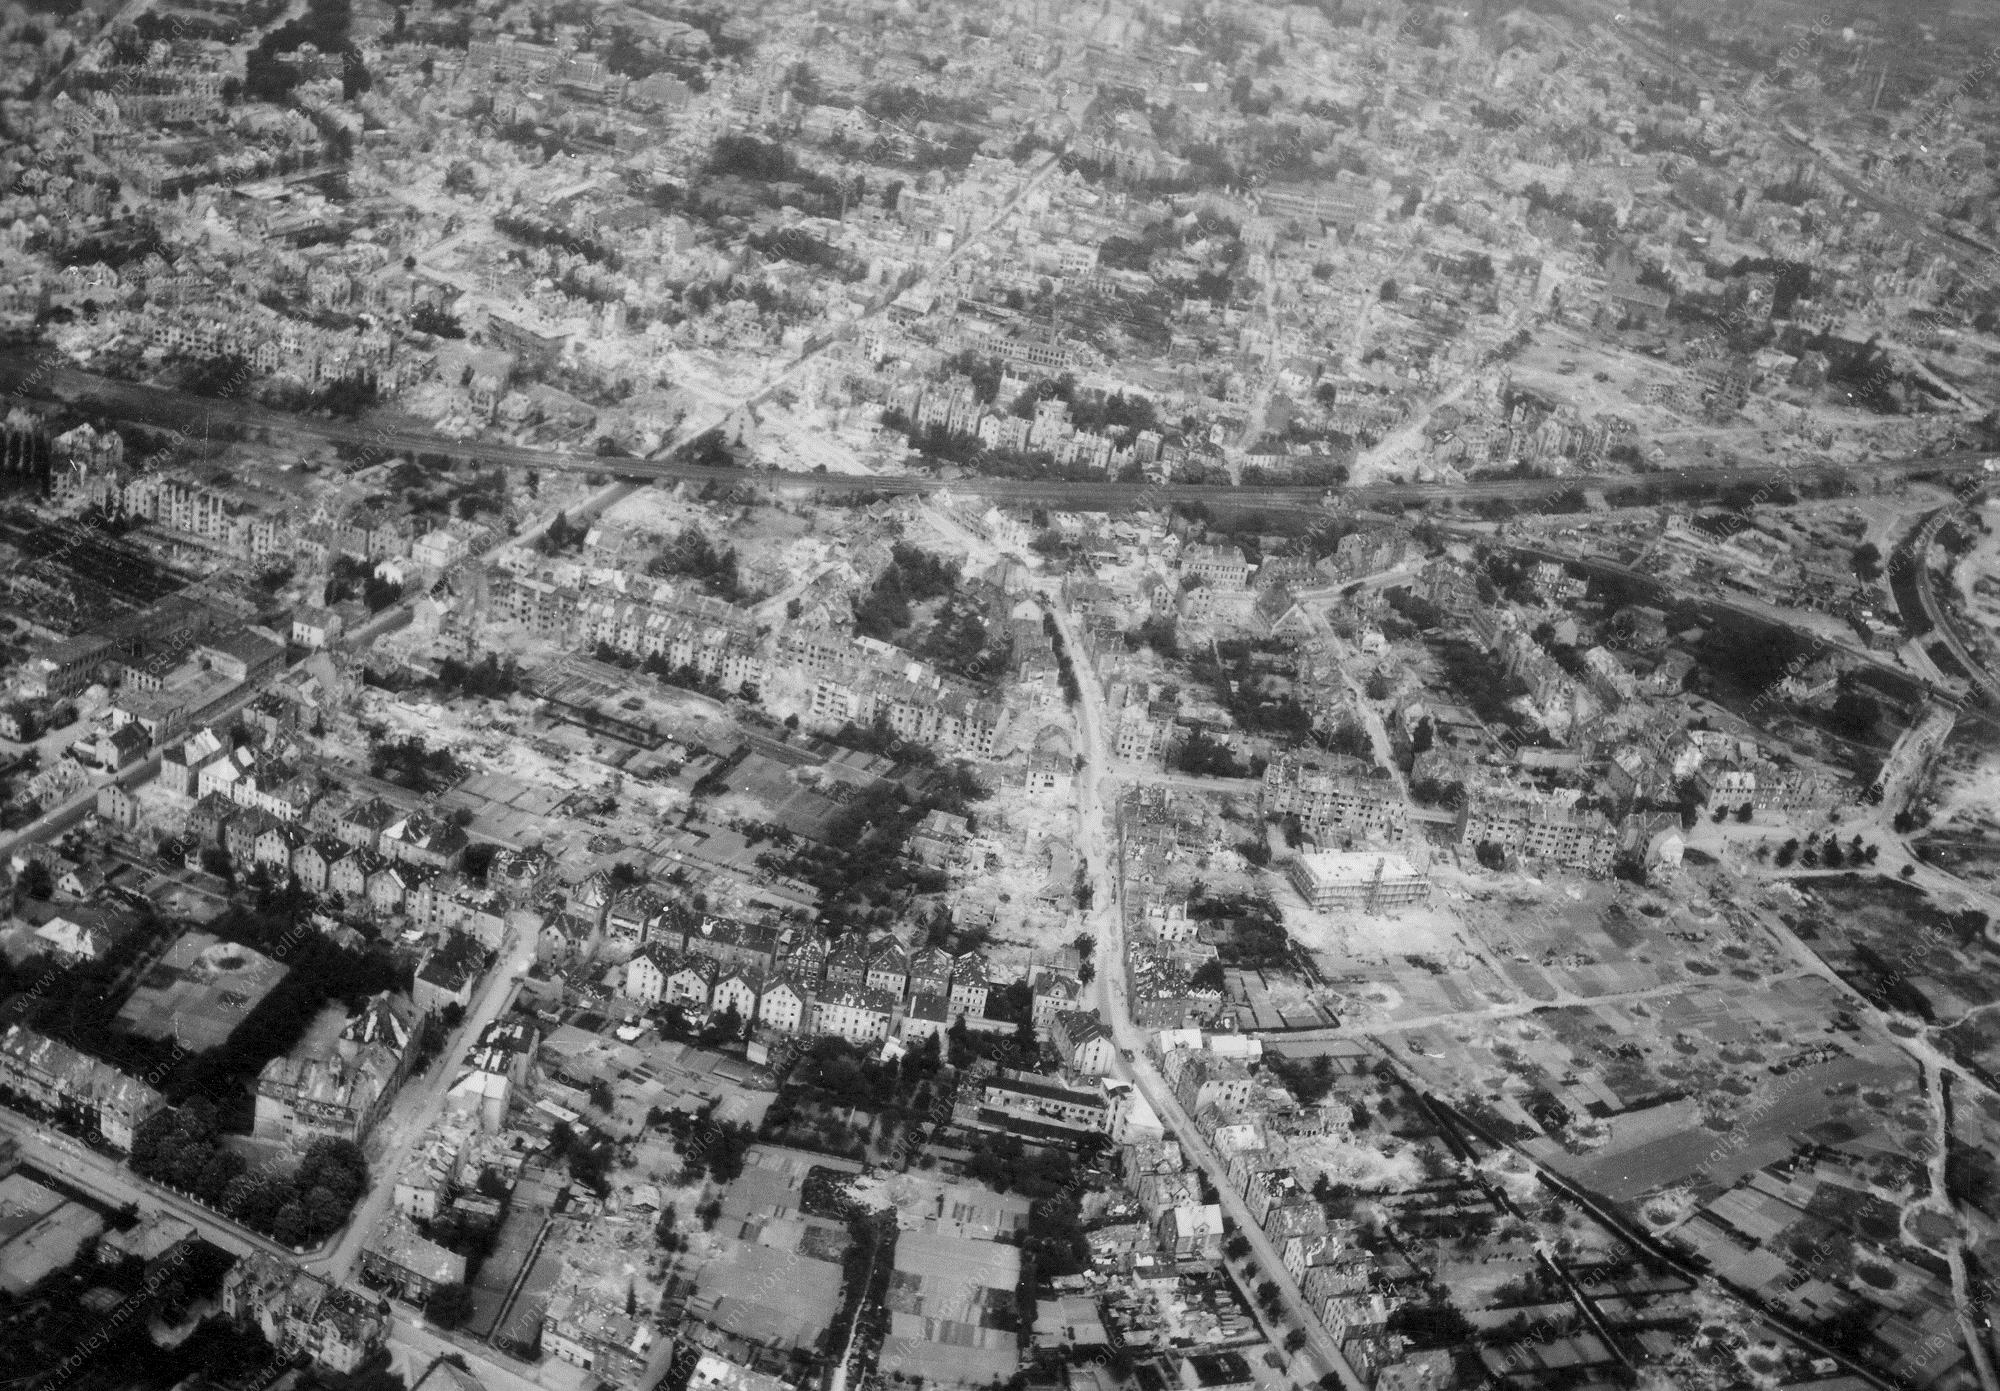 Osnabrück Luftbild im Krieg